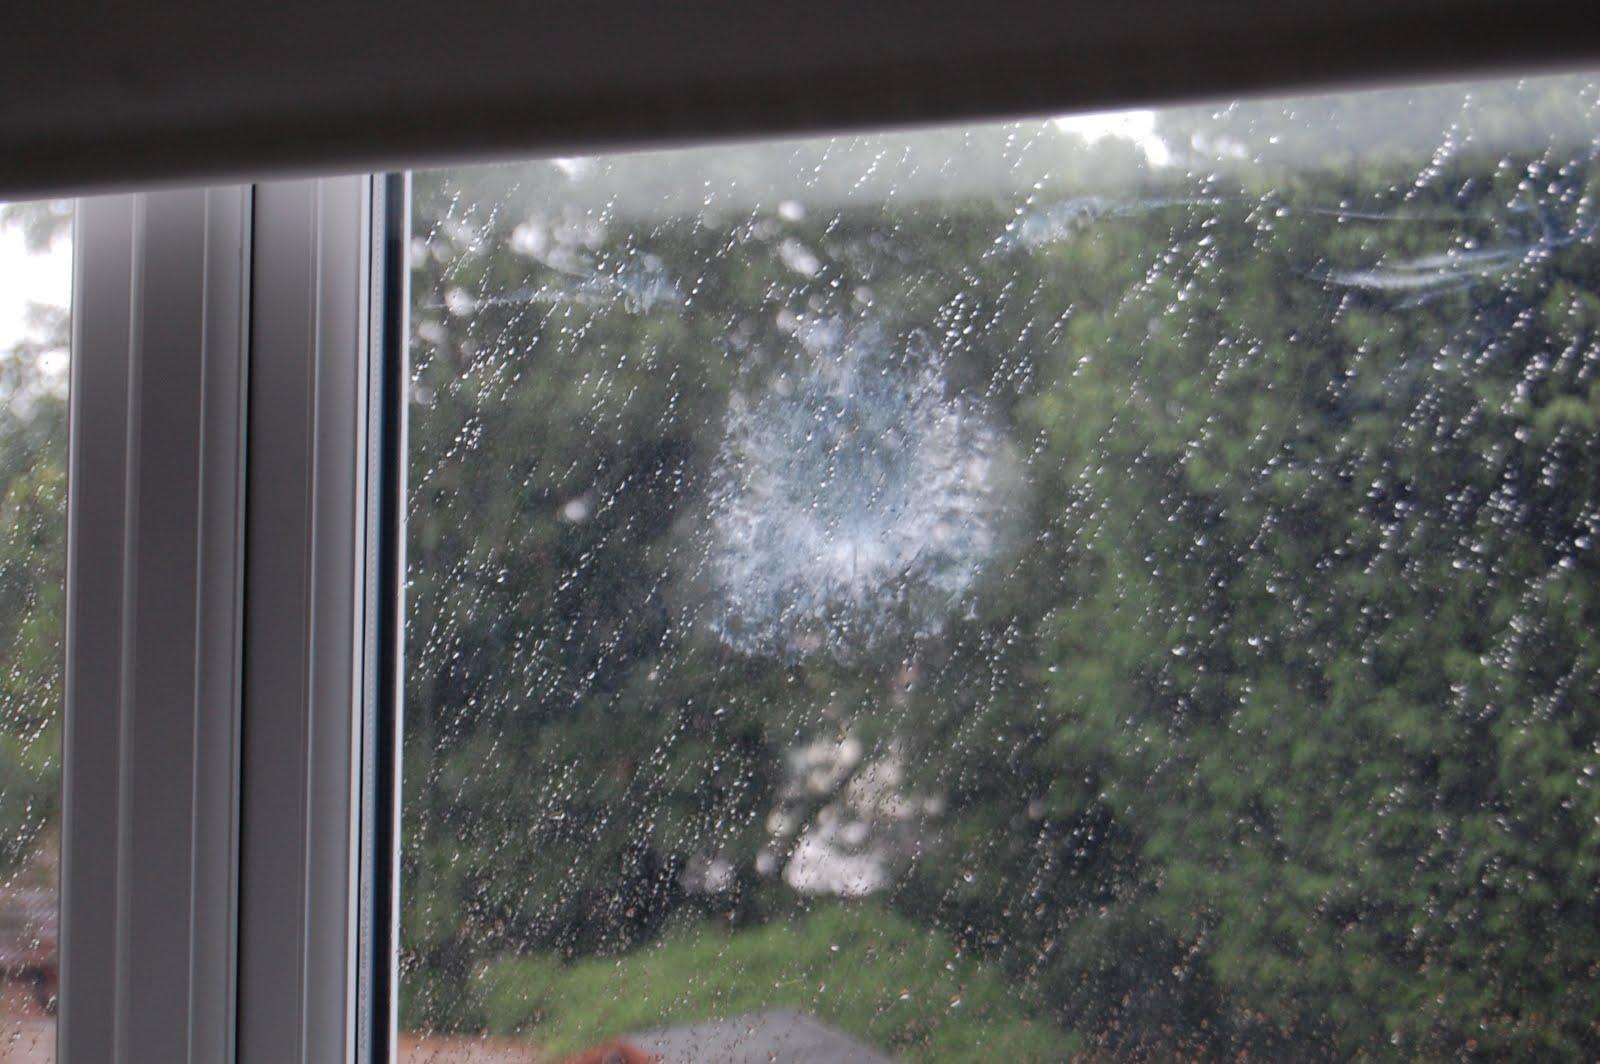 beclounor: Think a bird flew into my window